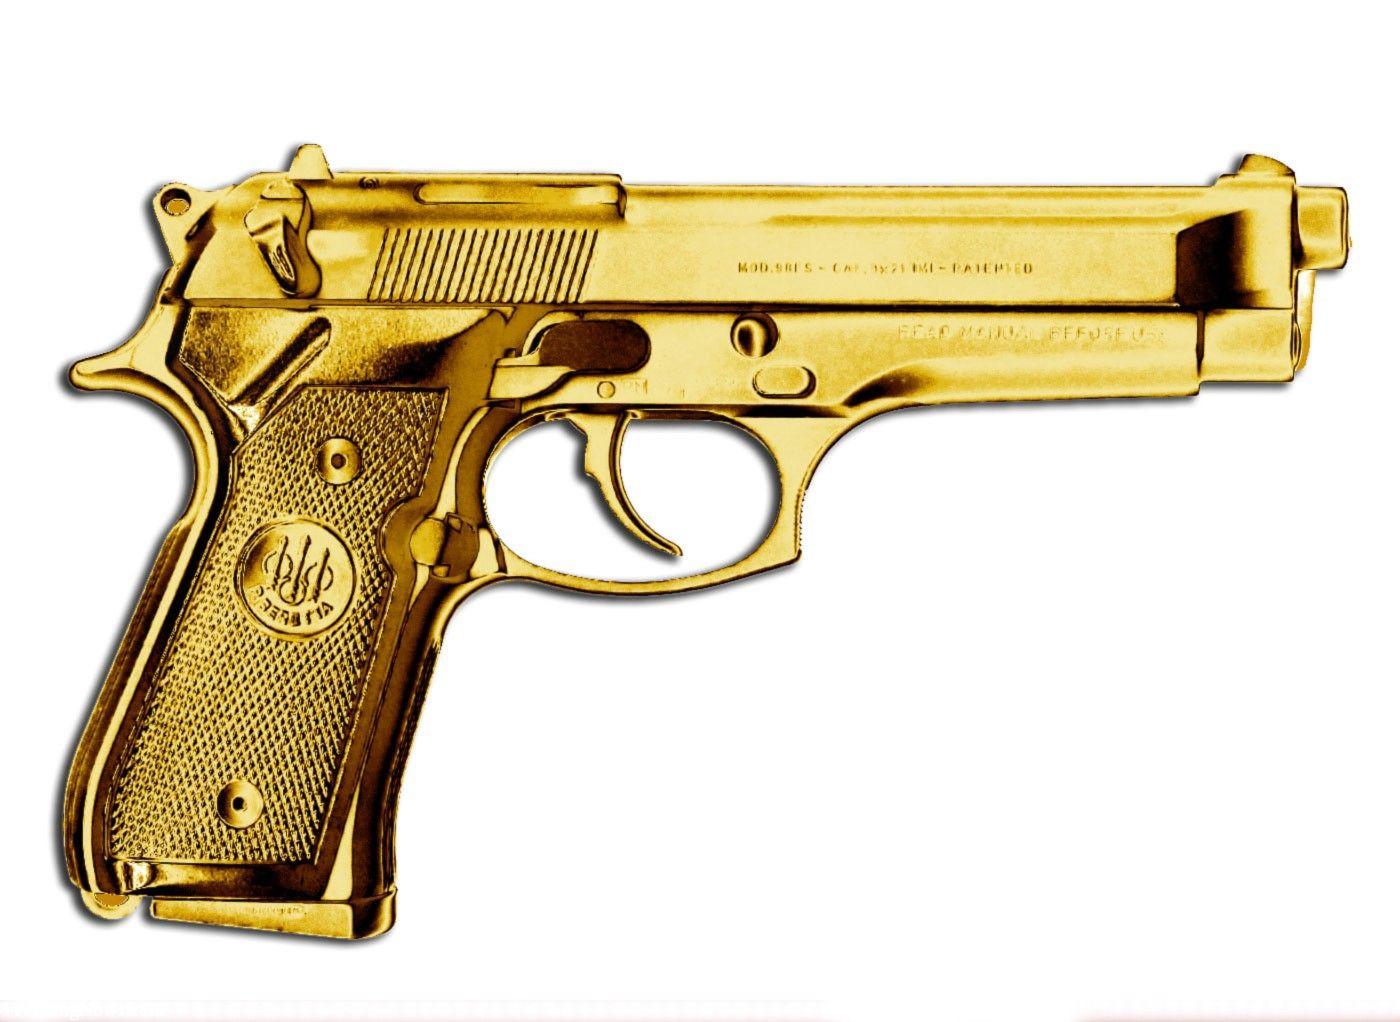 Do Guns Make Society Safer or More Violent Hot Spots Diva any